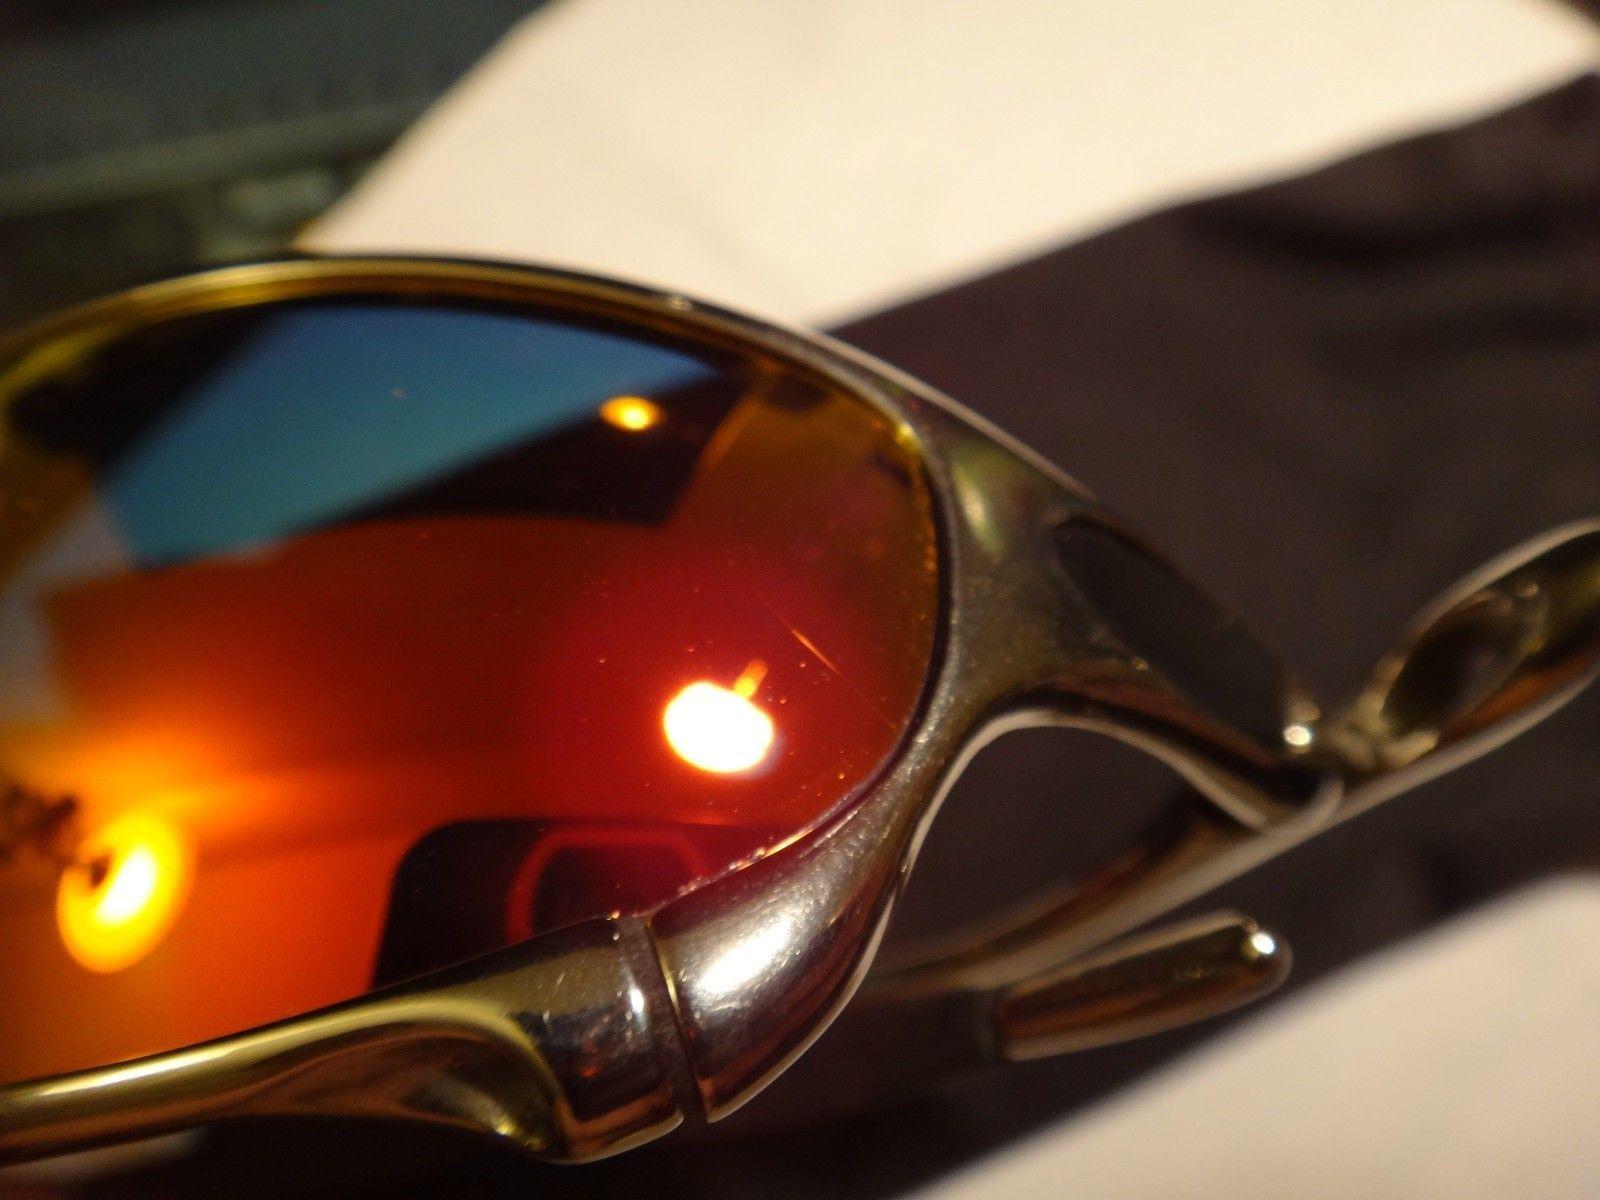 Polished juliet w/ fire iridium polarized lens $365 contUS - a.JPG